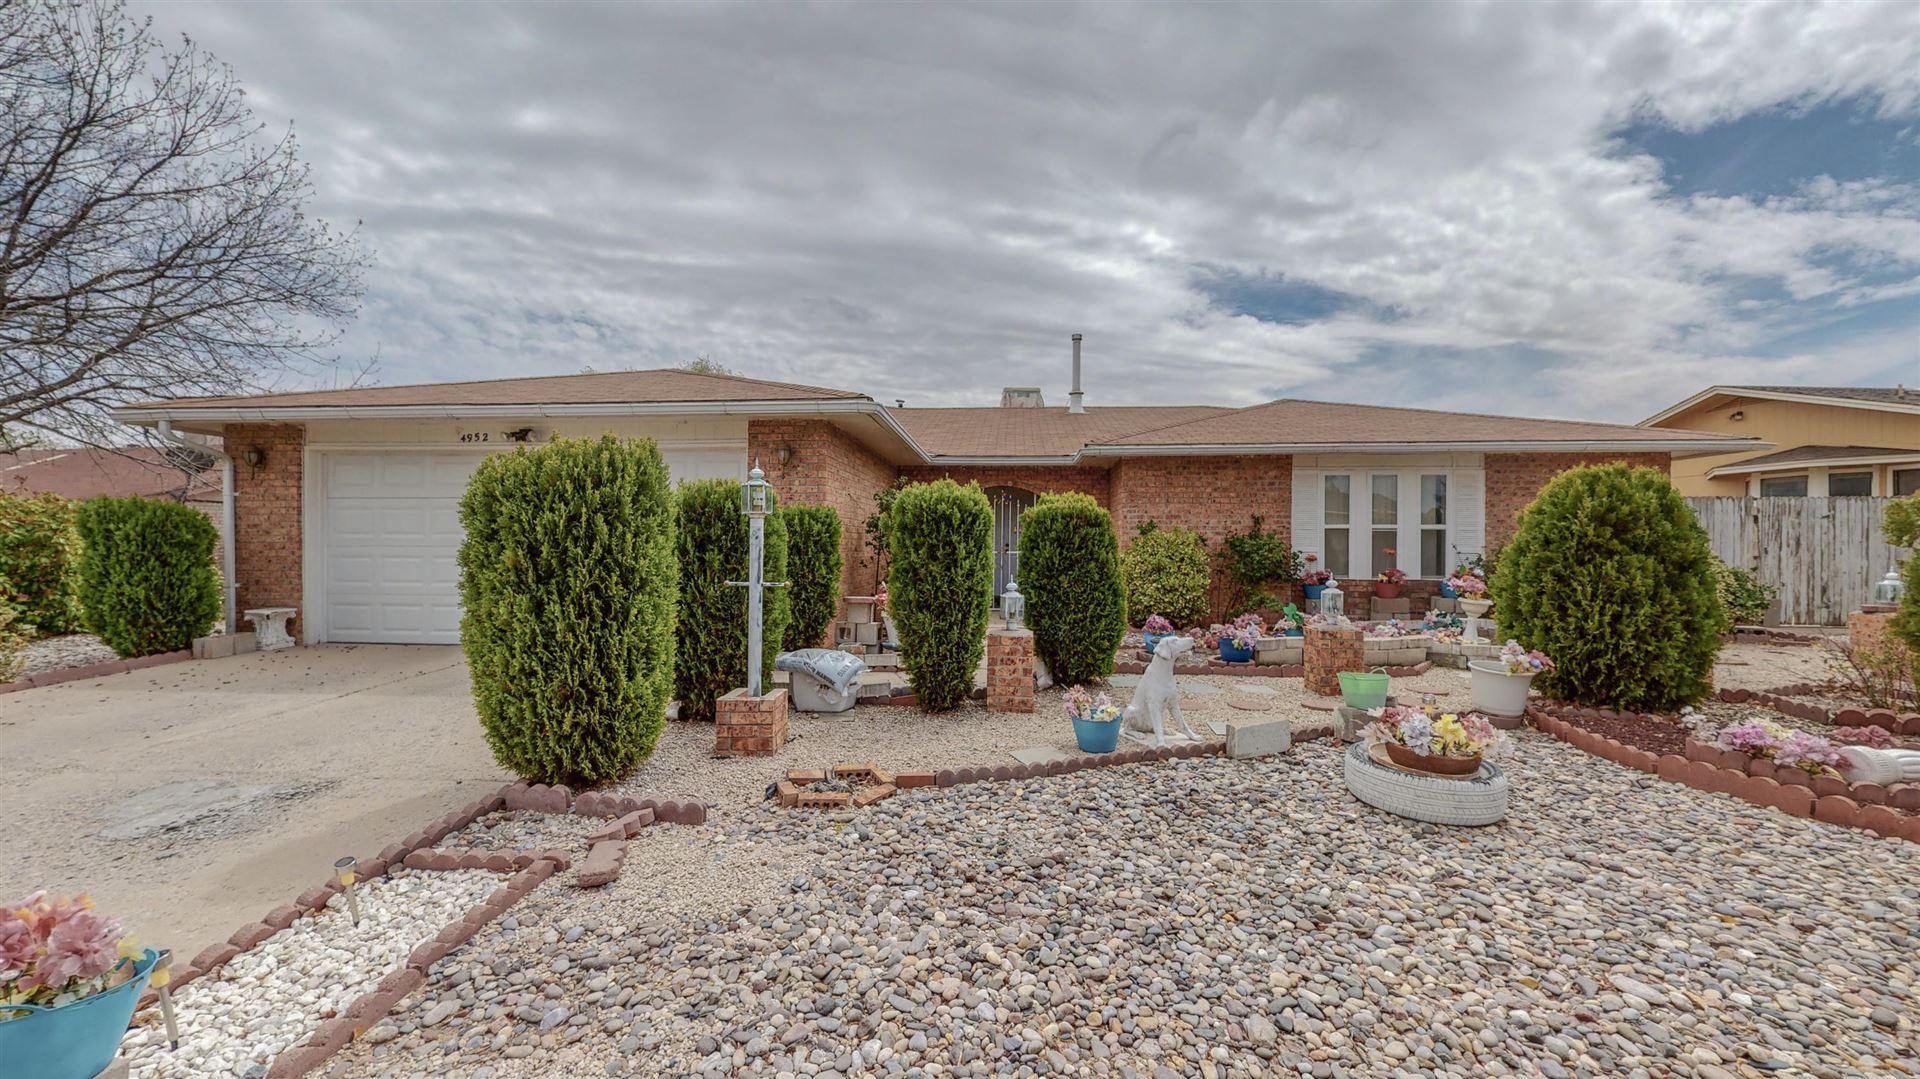 Photo of 4952 CHROMIUM Drive NE, Rio Rancho, NM 87124 (MLS # 989553)